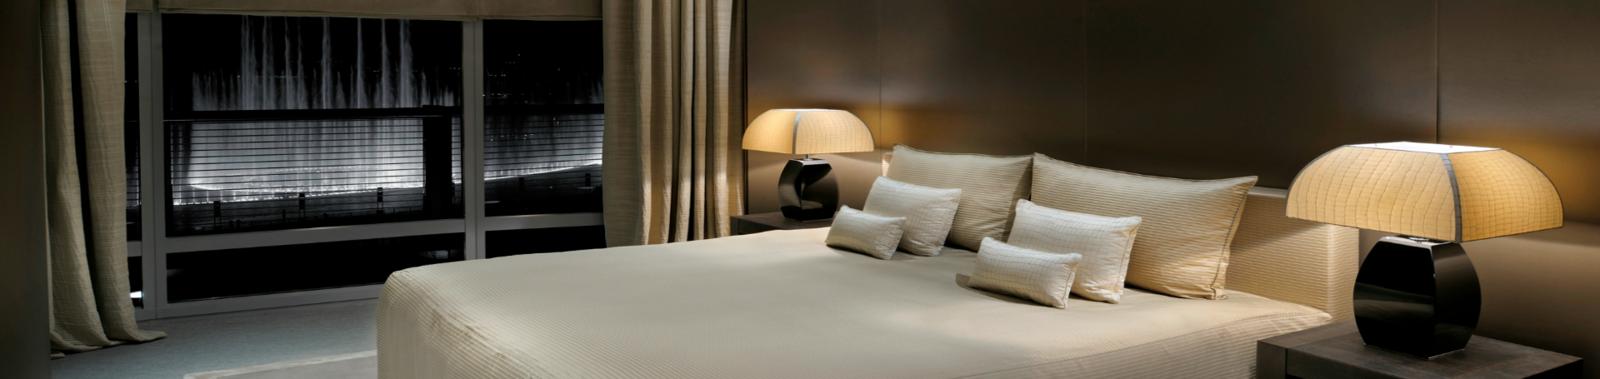 armani-hotel-dubai-fountain-suite-1920x900